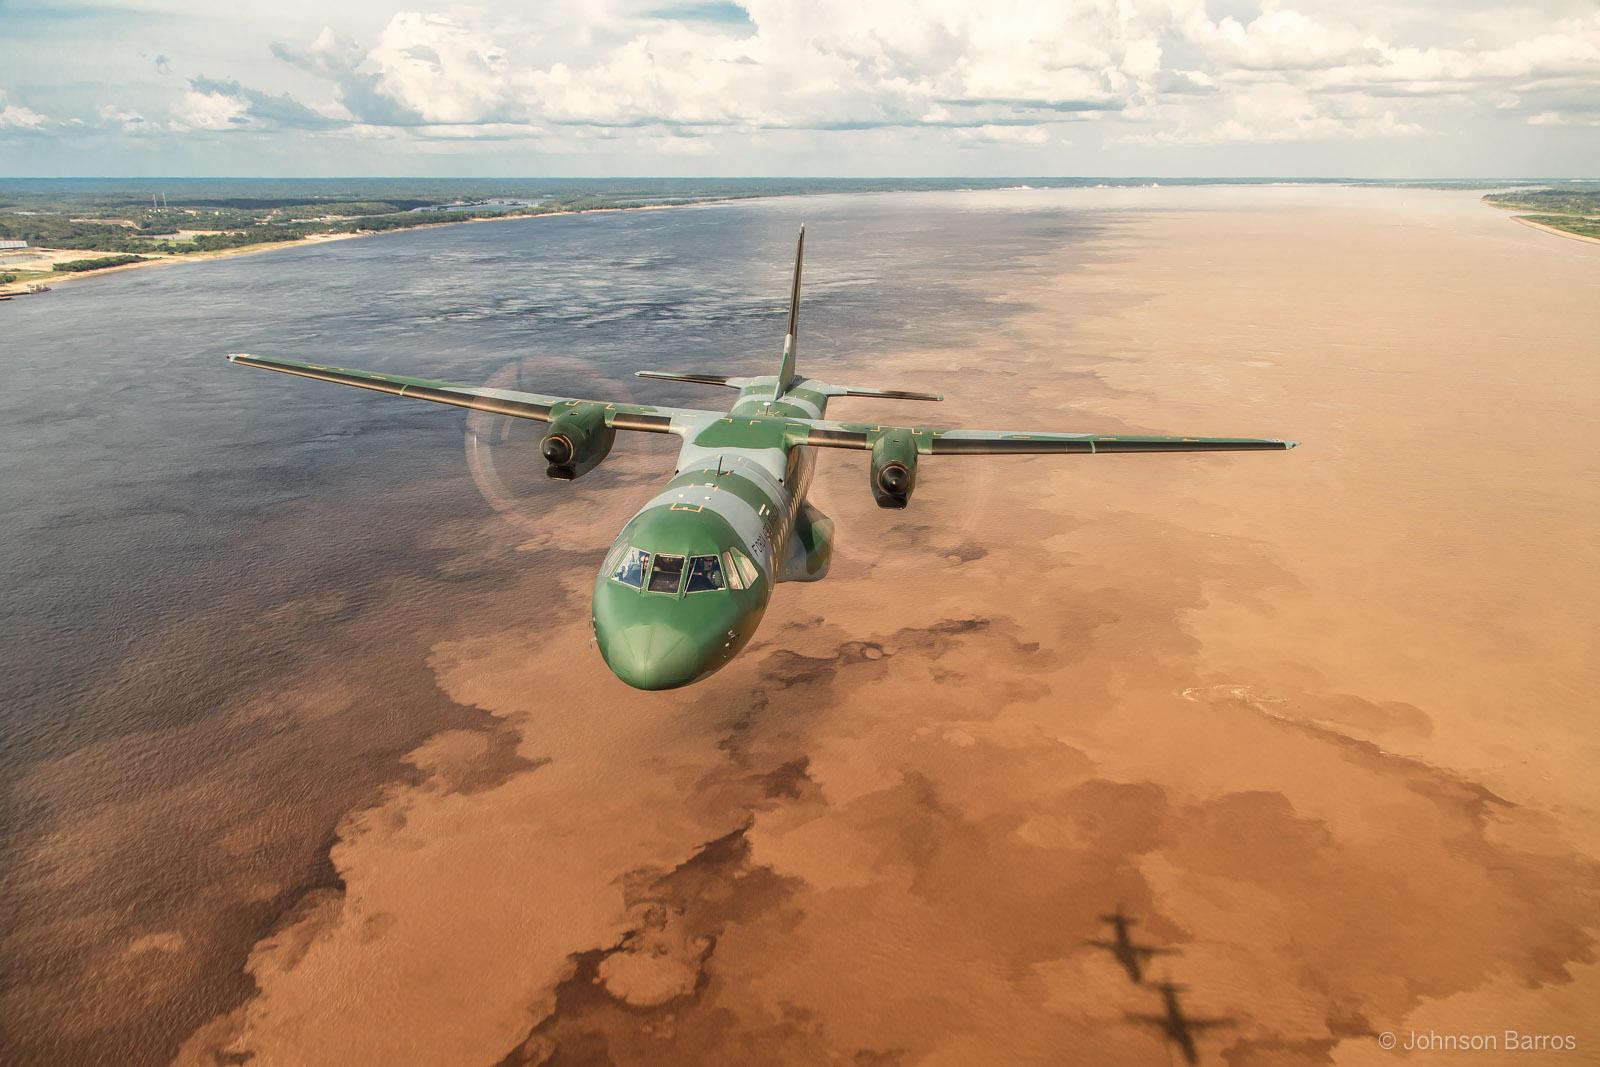 C-295 above the Amazon River